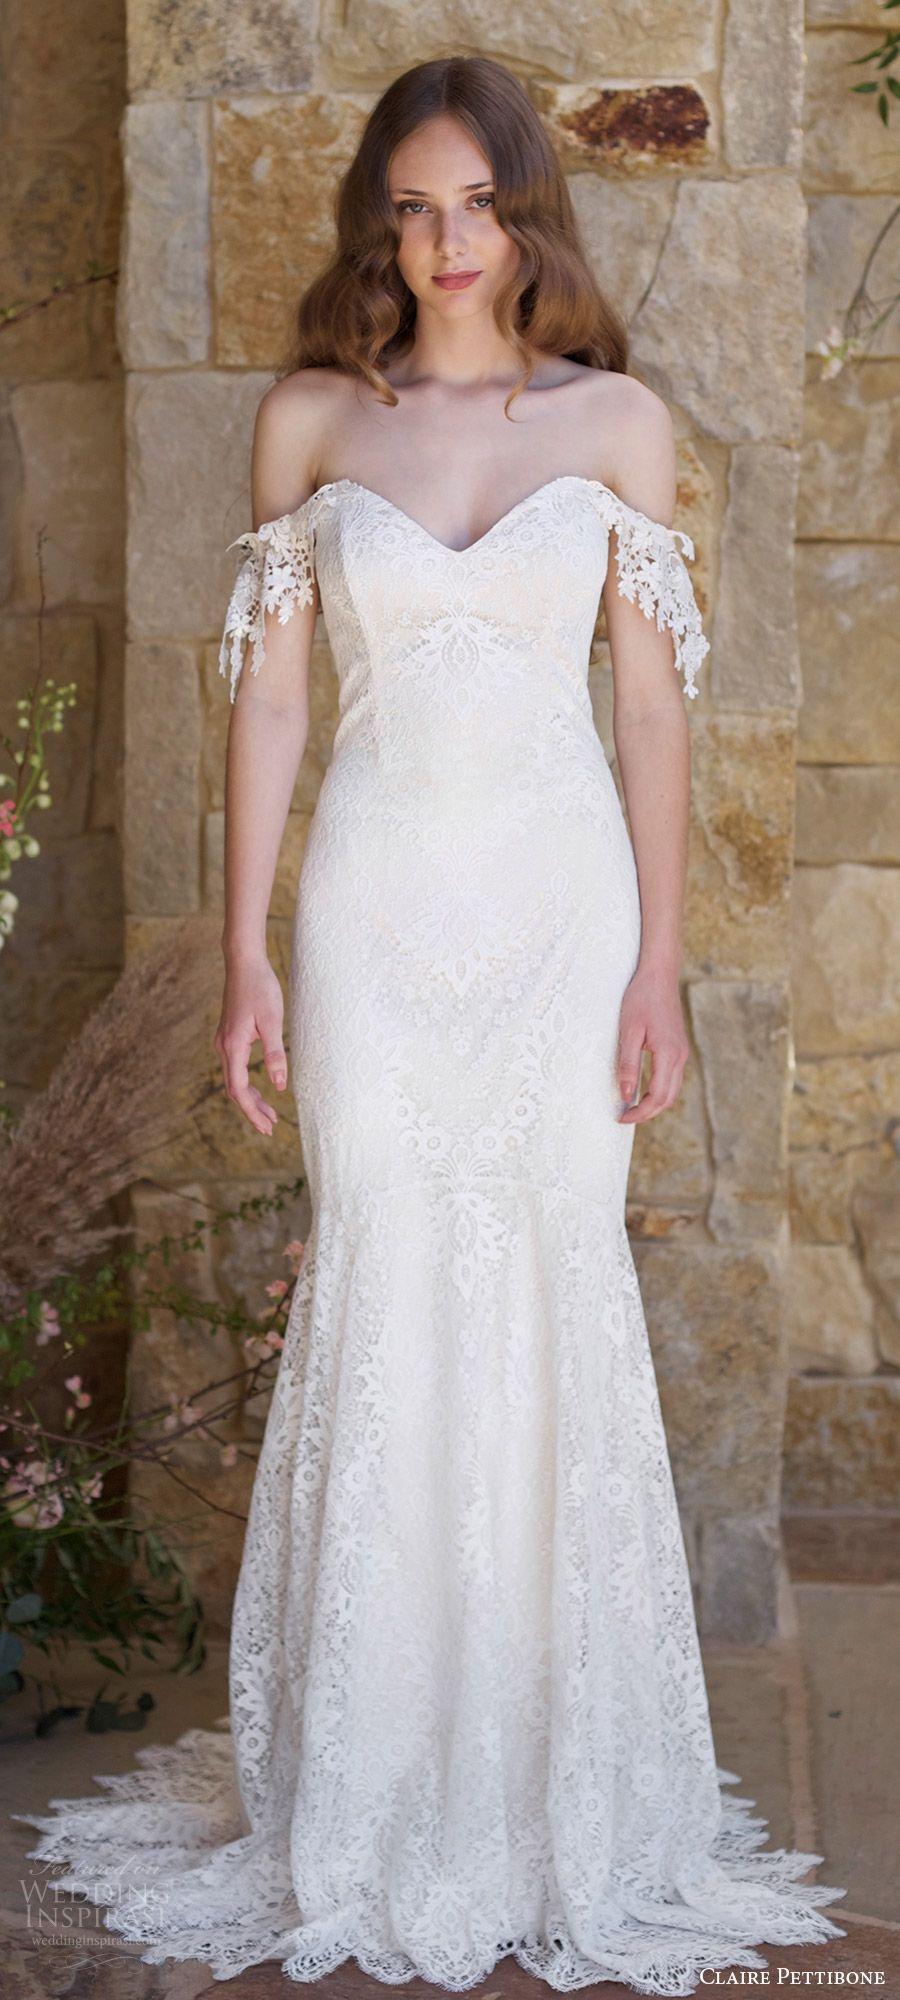 Lace mermaid wedding dresses 2018